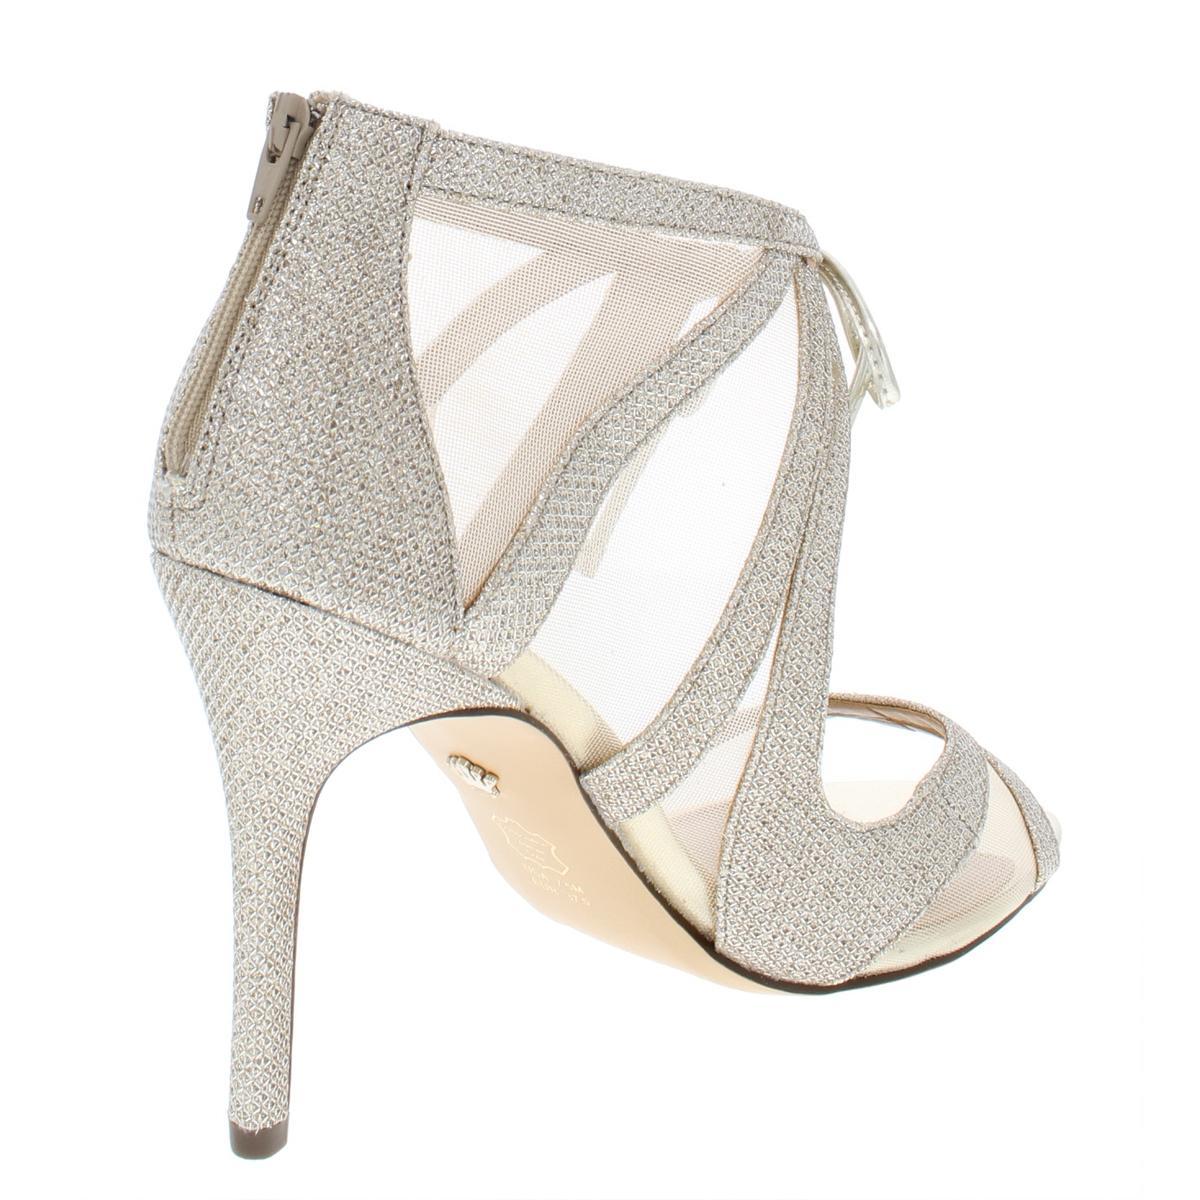 Nina-Womens-Cherie-Heels-Evening-Sandals-Shoes-BHFO-6446 thumbnail 6